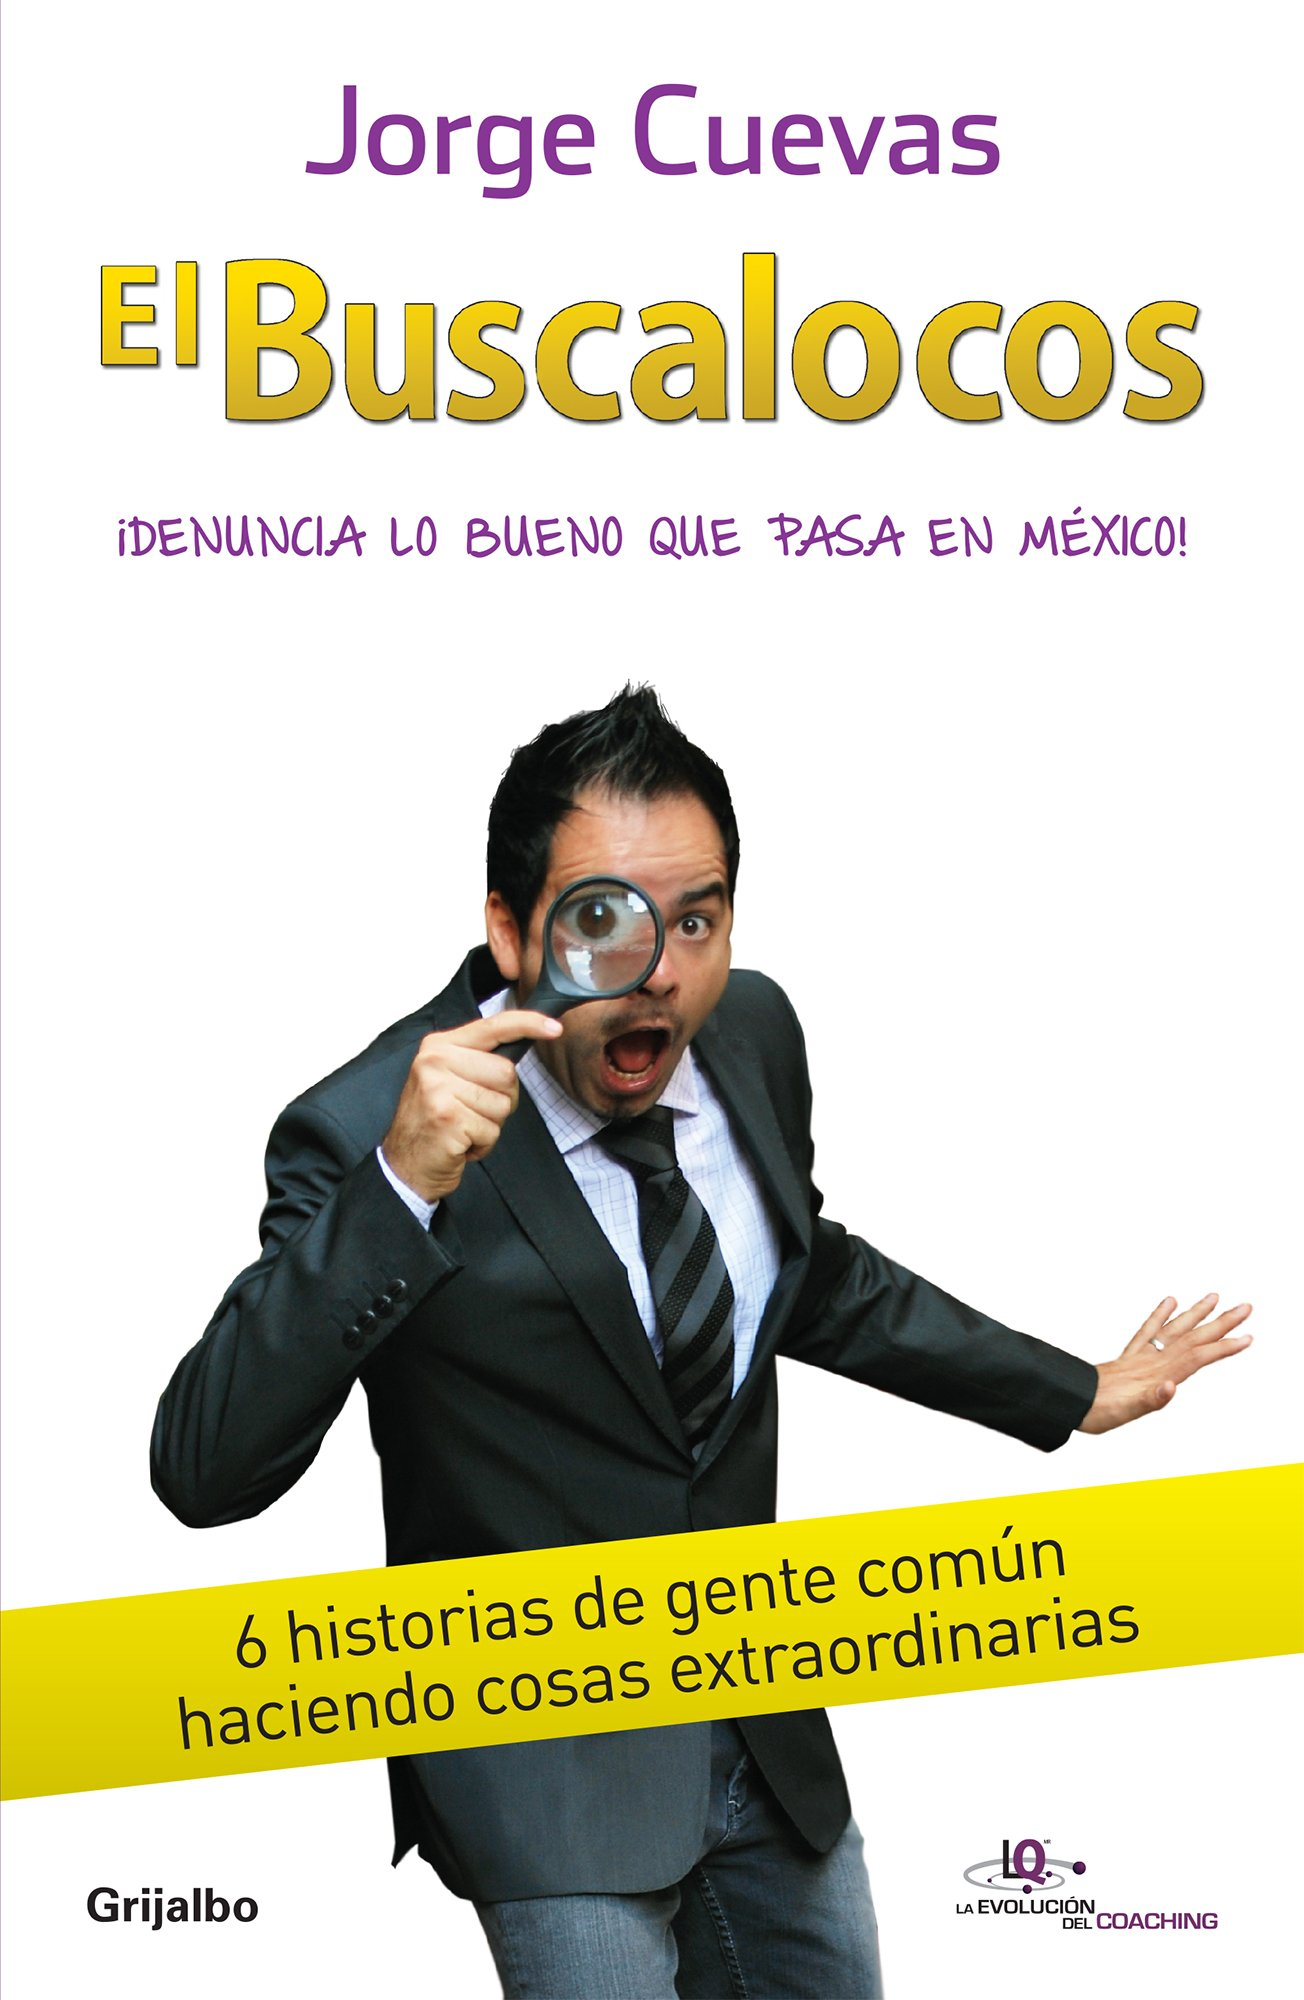 El buscalocos (Spanish Edition): Jorge Cuevas: 9786073117463: Amazon.com: Books